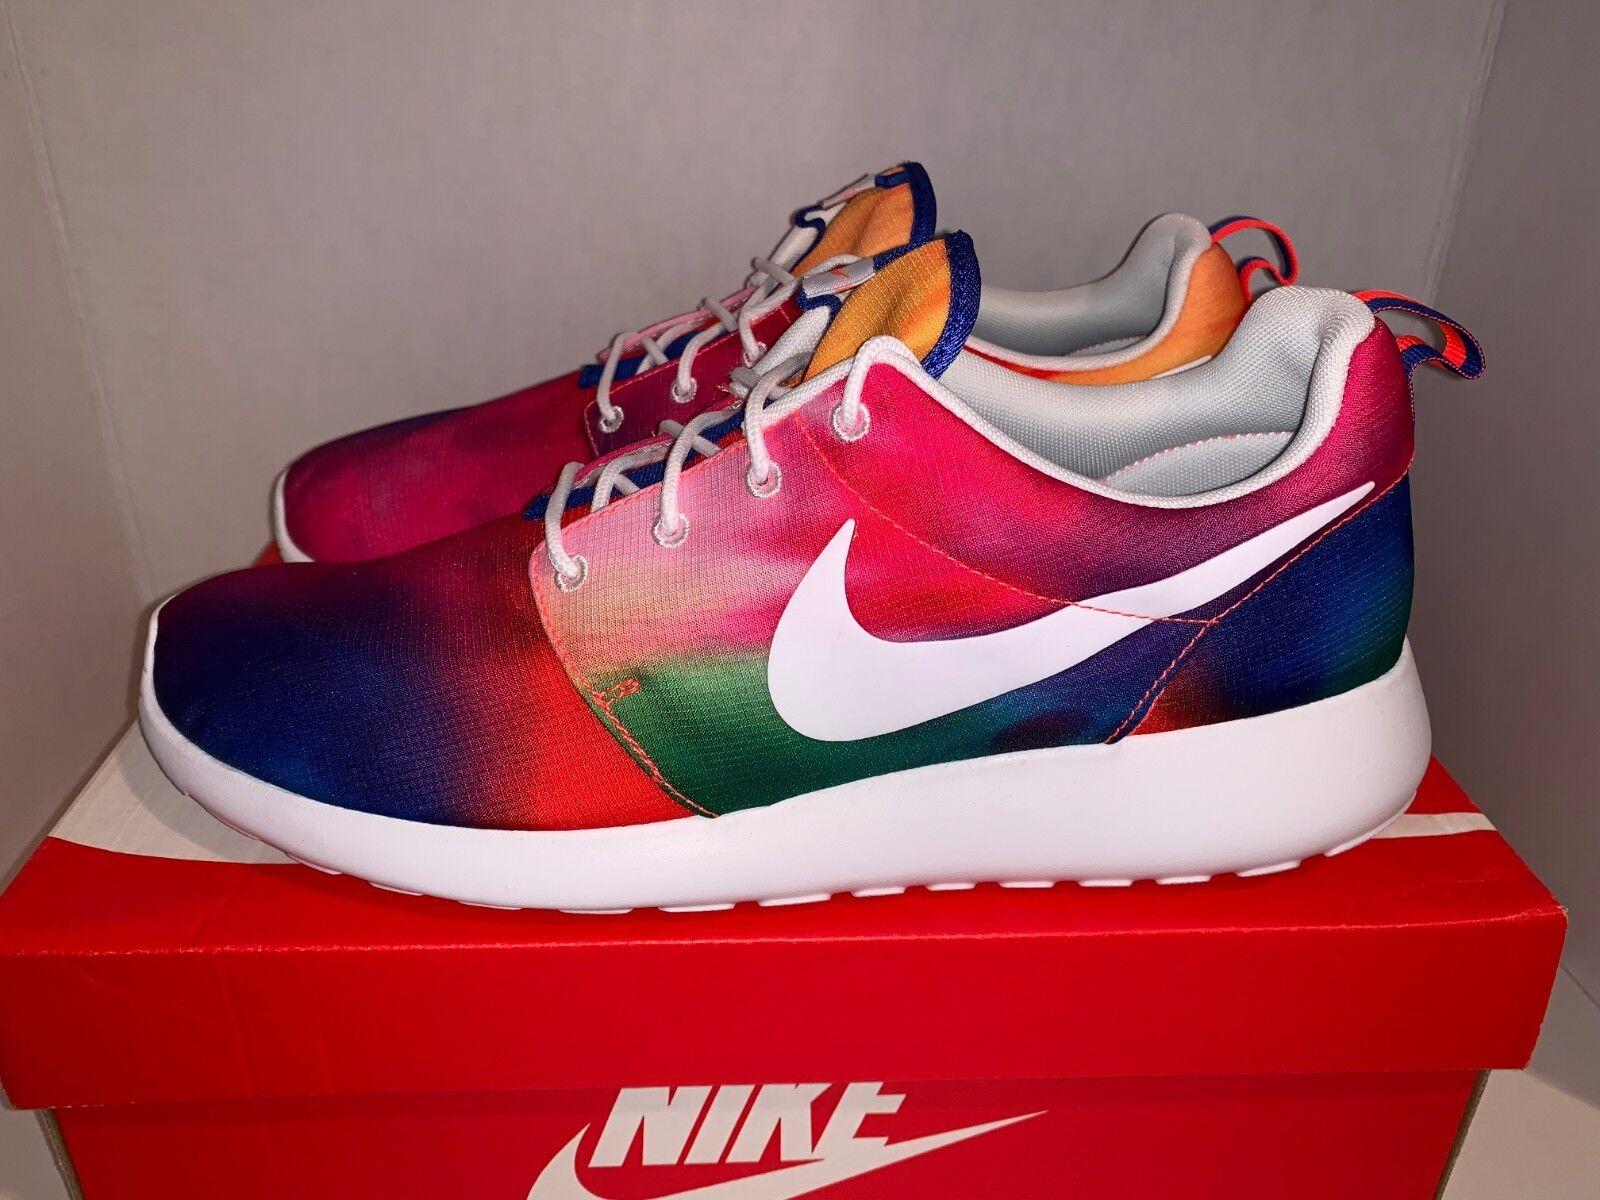 Nike Roshe Run Print Tie Dye QS Size 9 11.5